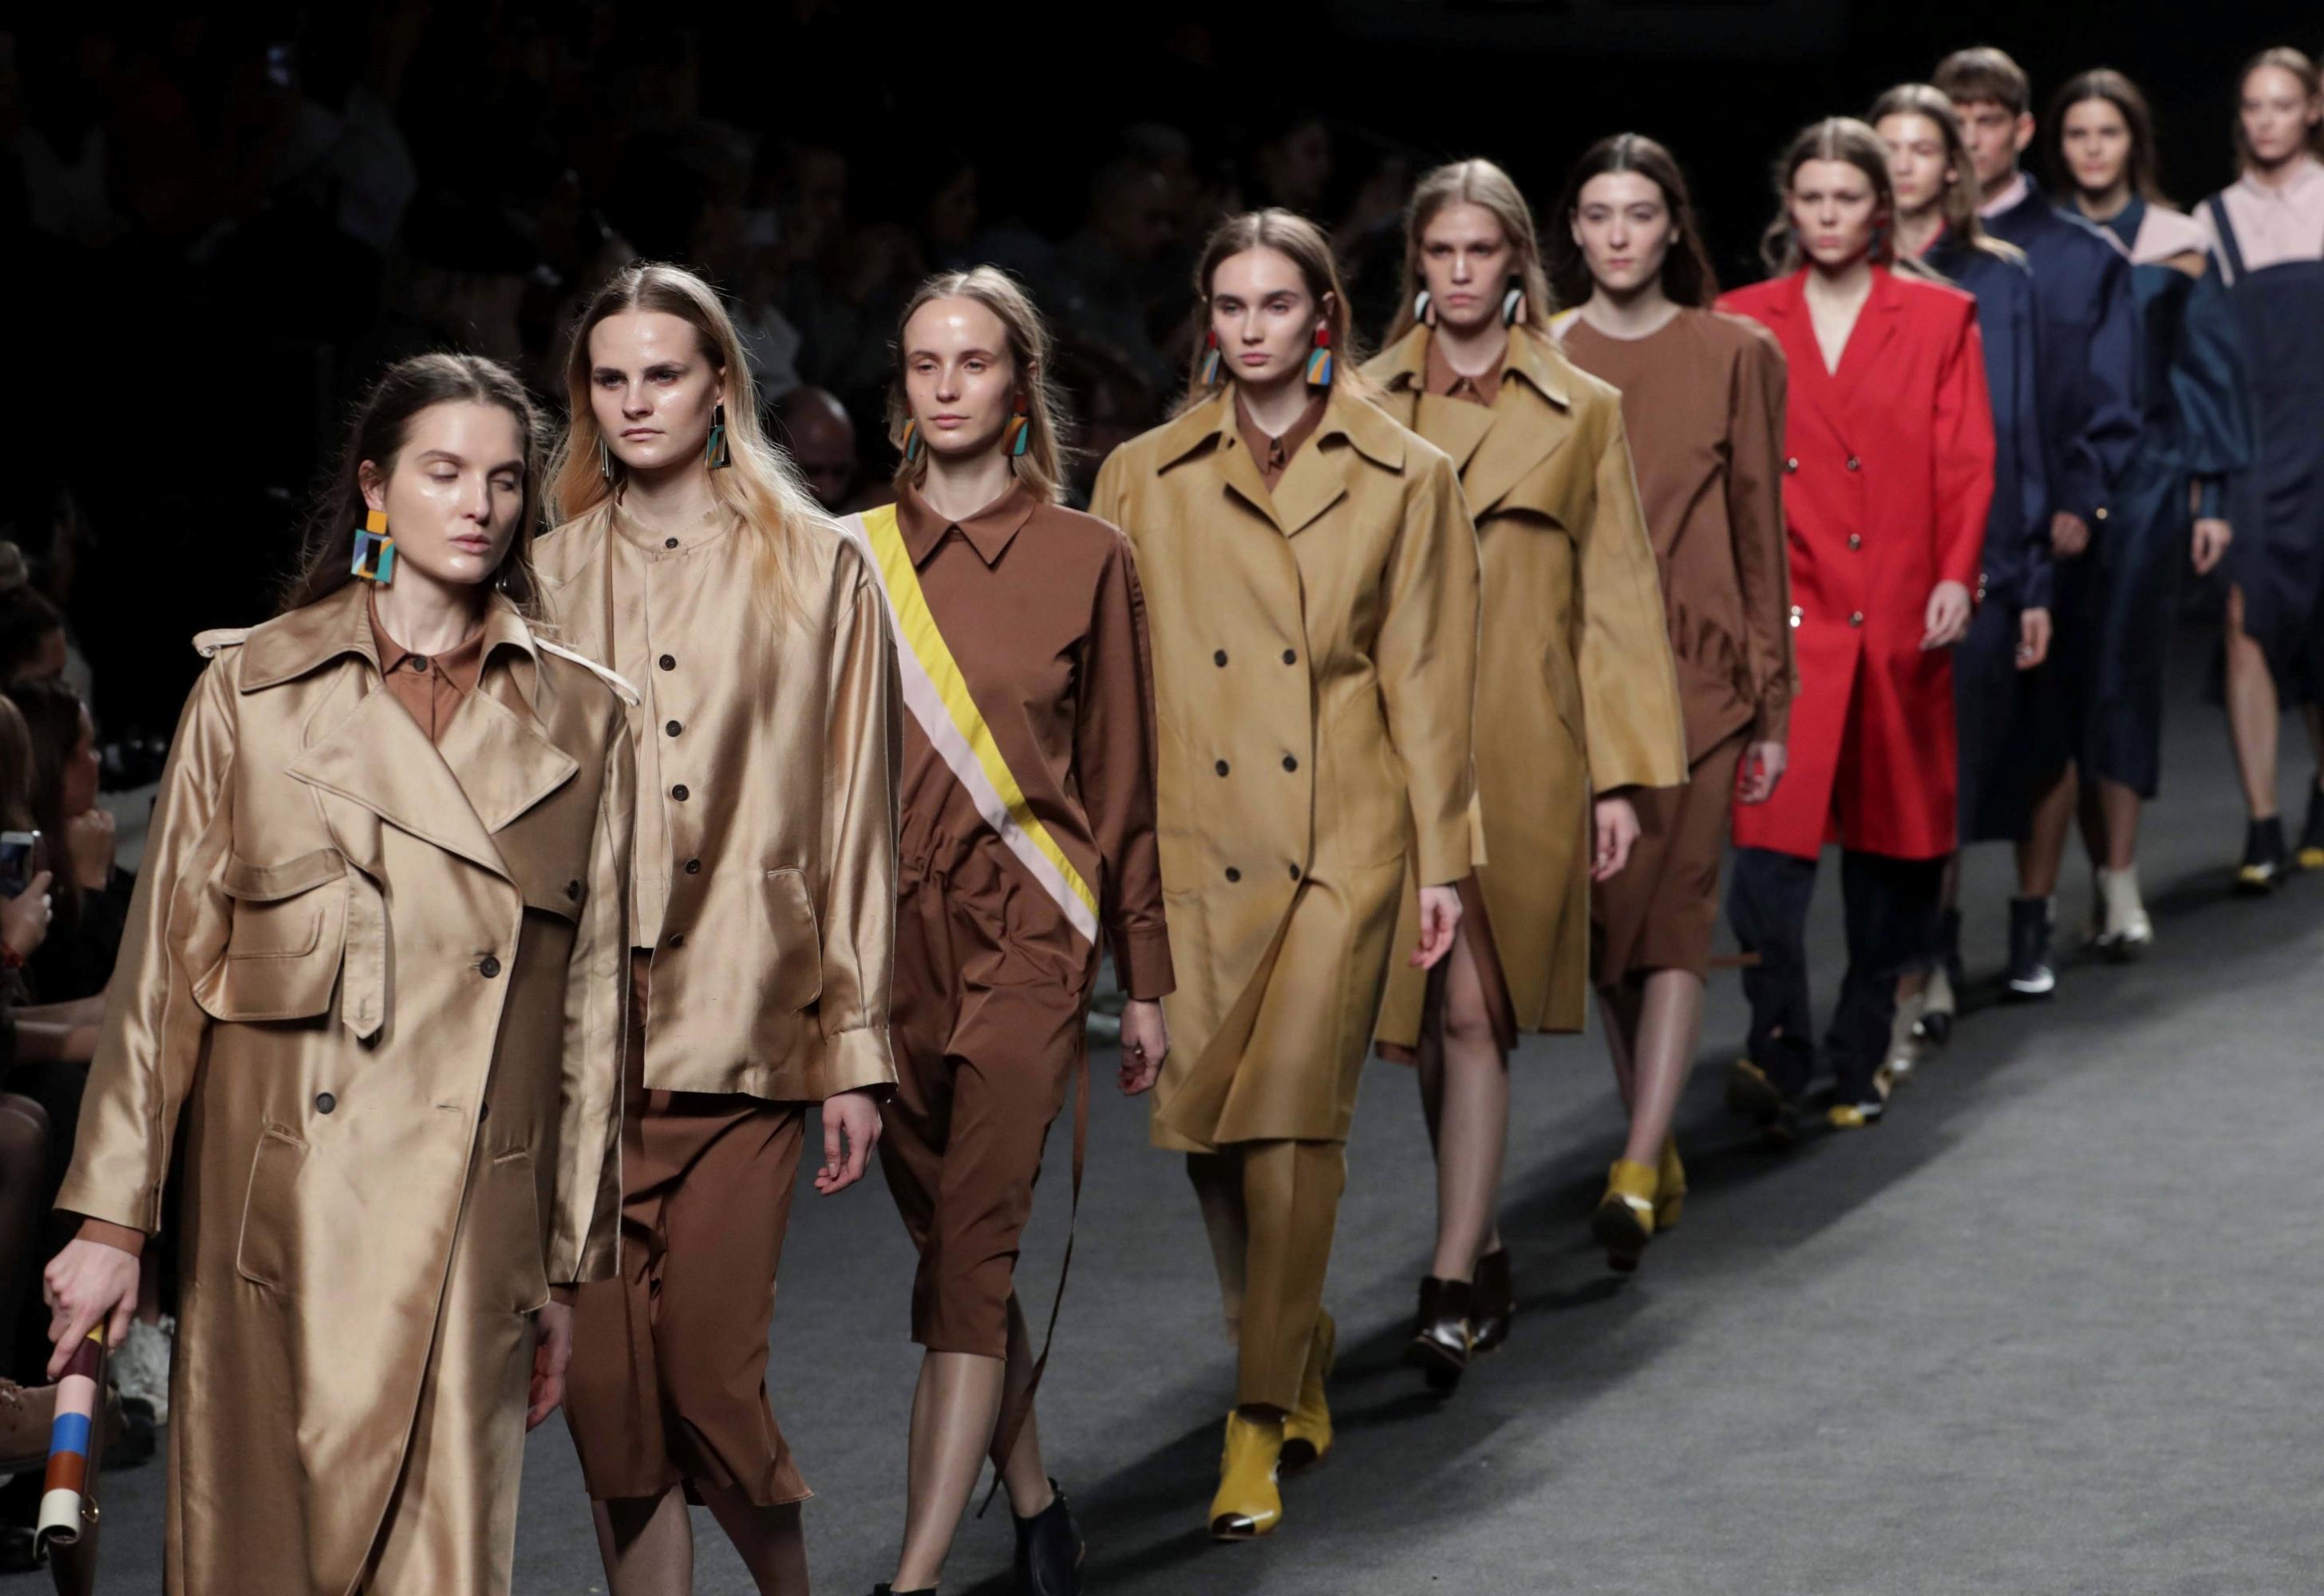 2be85cdcb7 Medio Ambiente La industria textil se suma al carro de la moda sostenible